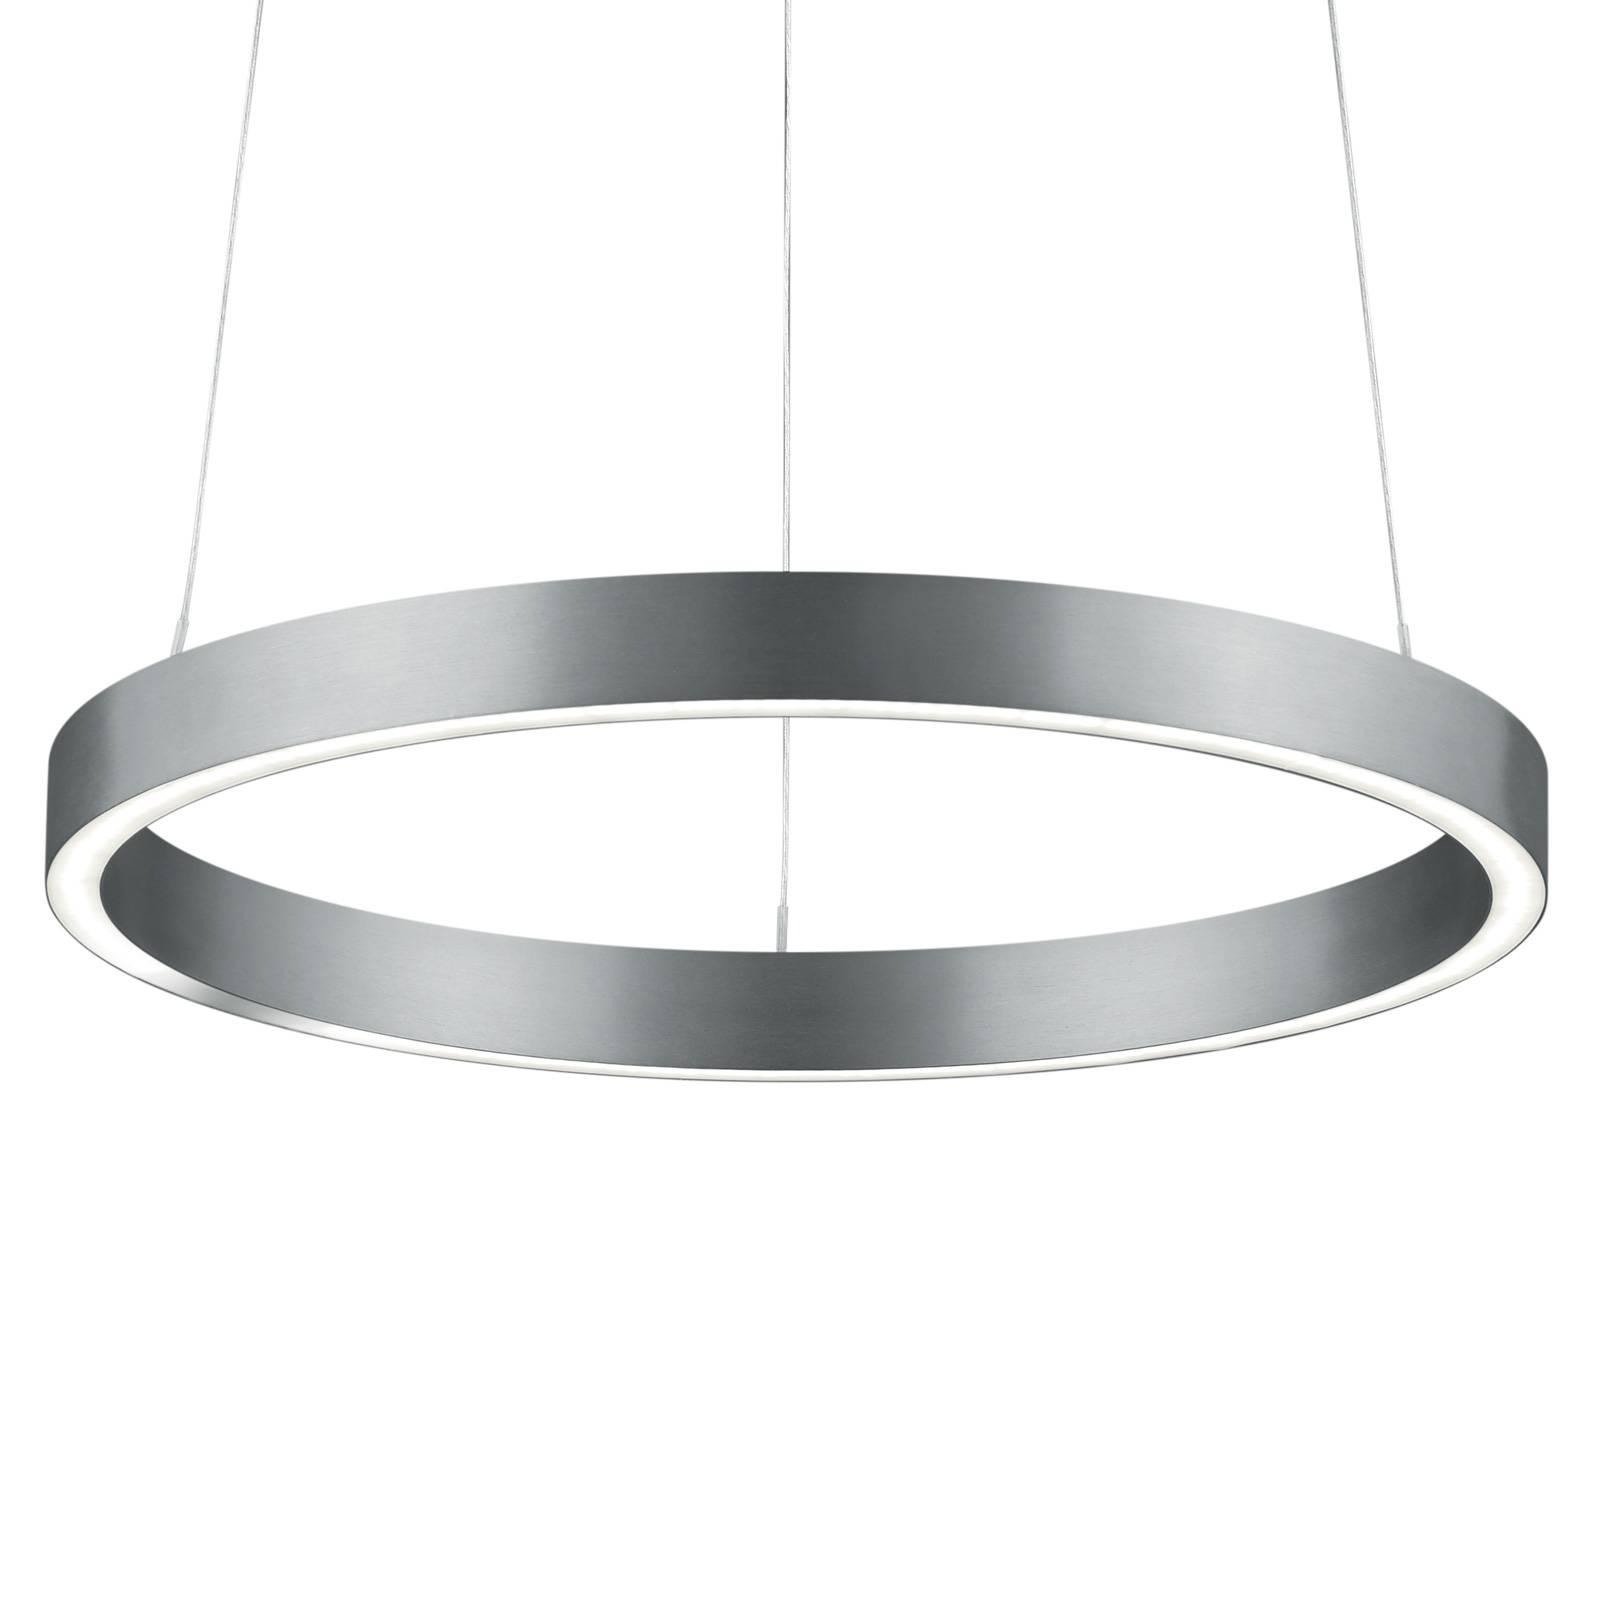 LED-riippuvalaisin Svea-40 eleohjauksella, nikkeli